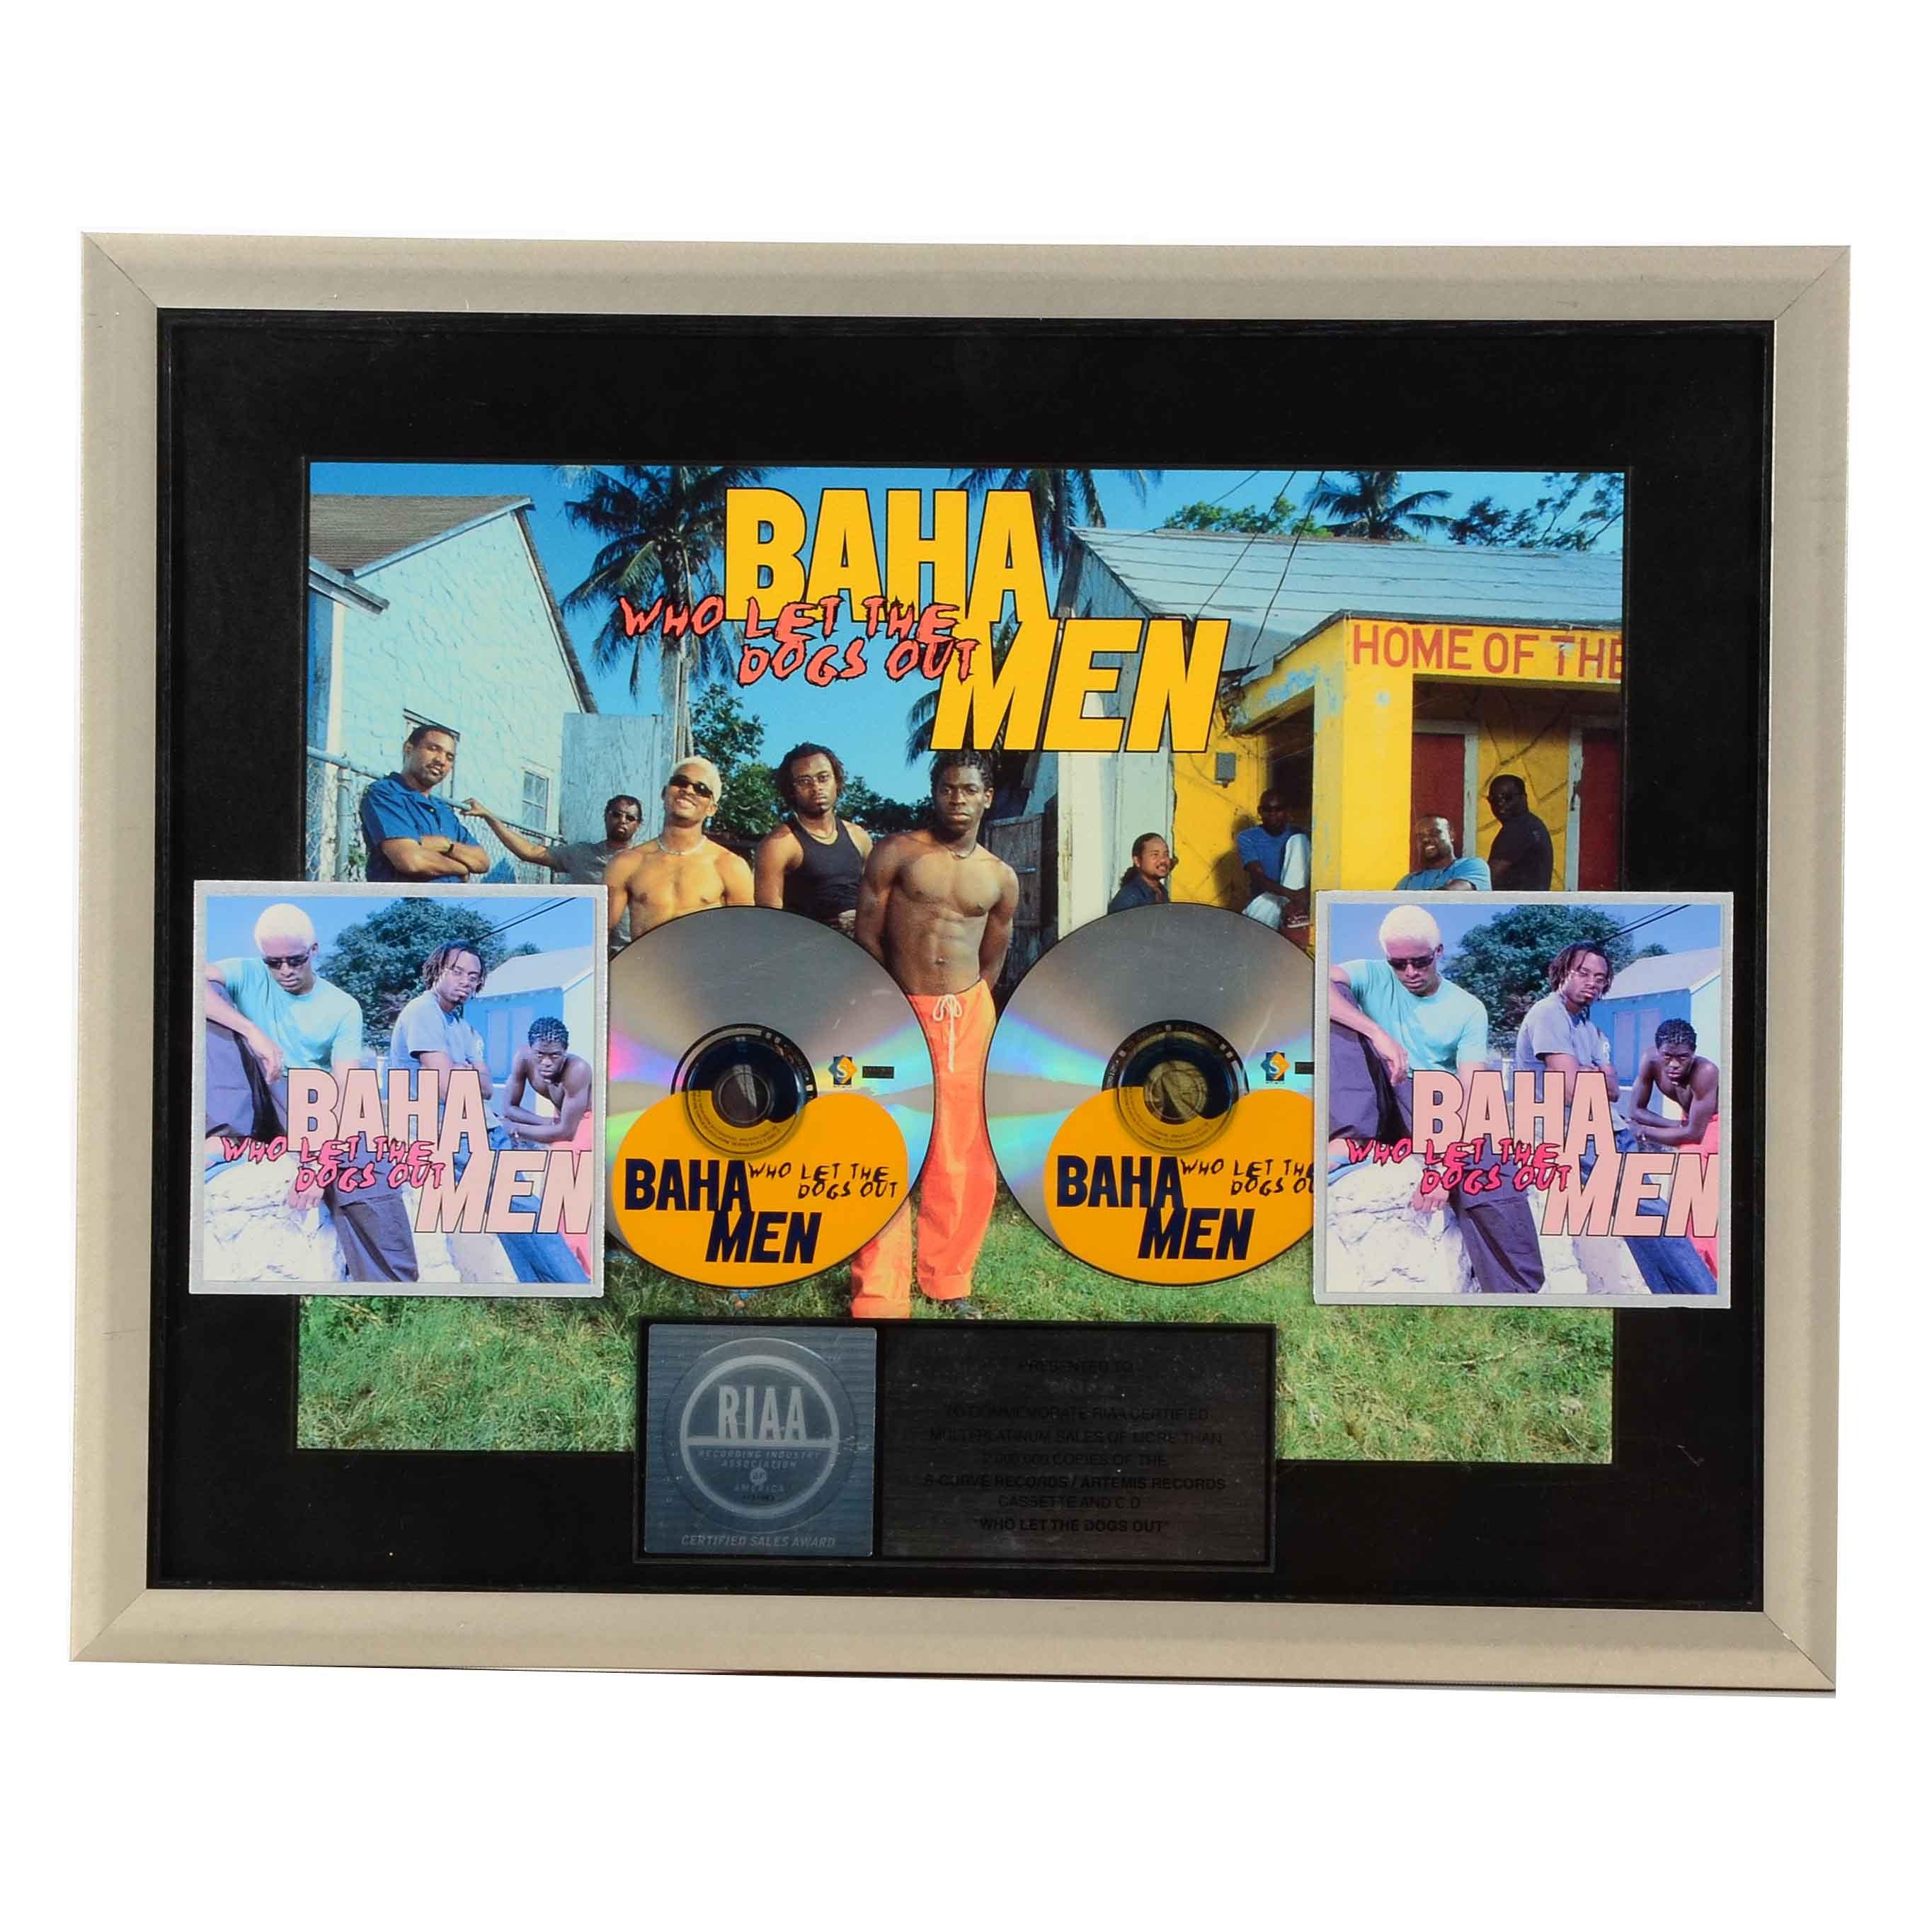 Baha Men Q102 Award Display